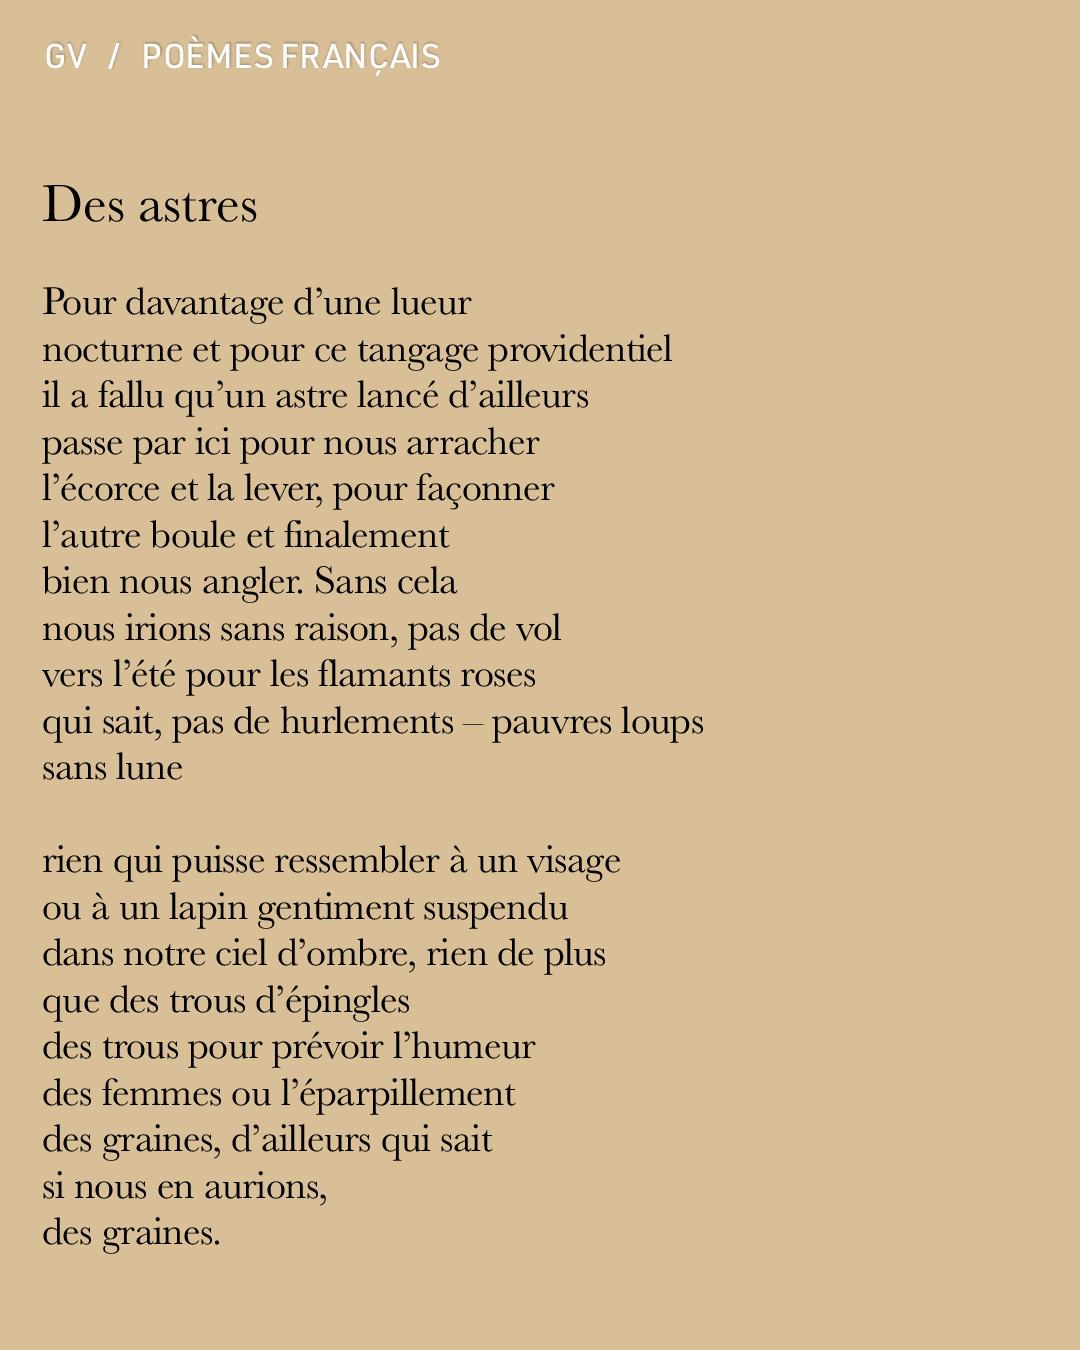 Gvion-PoemesF-DesAstres.jpg